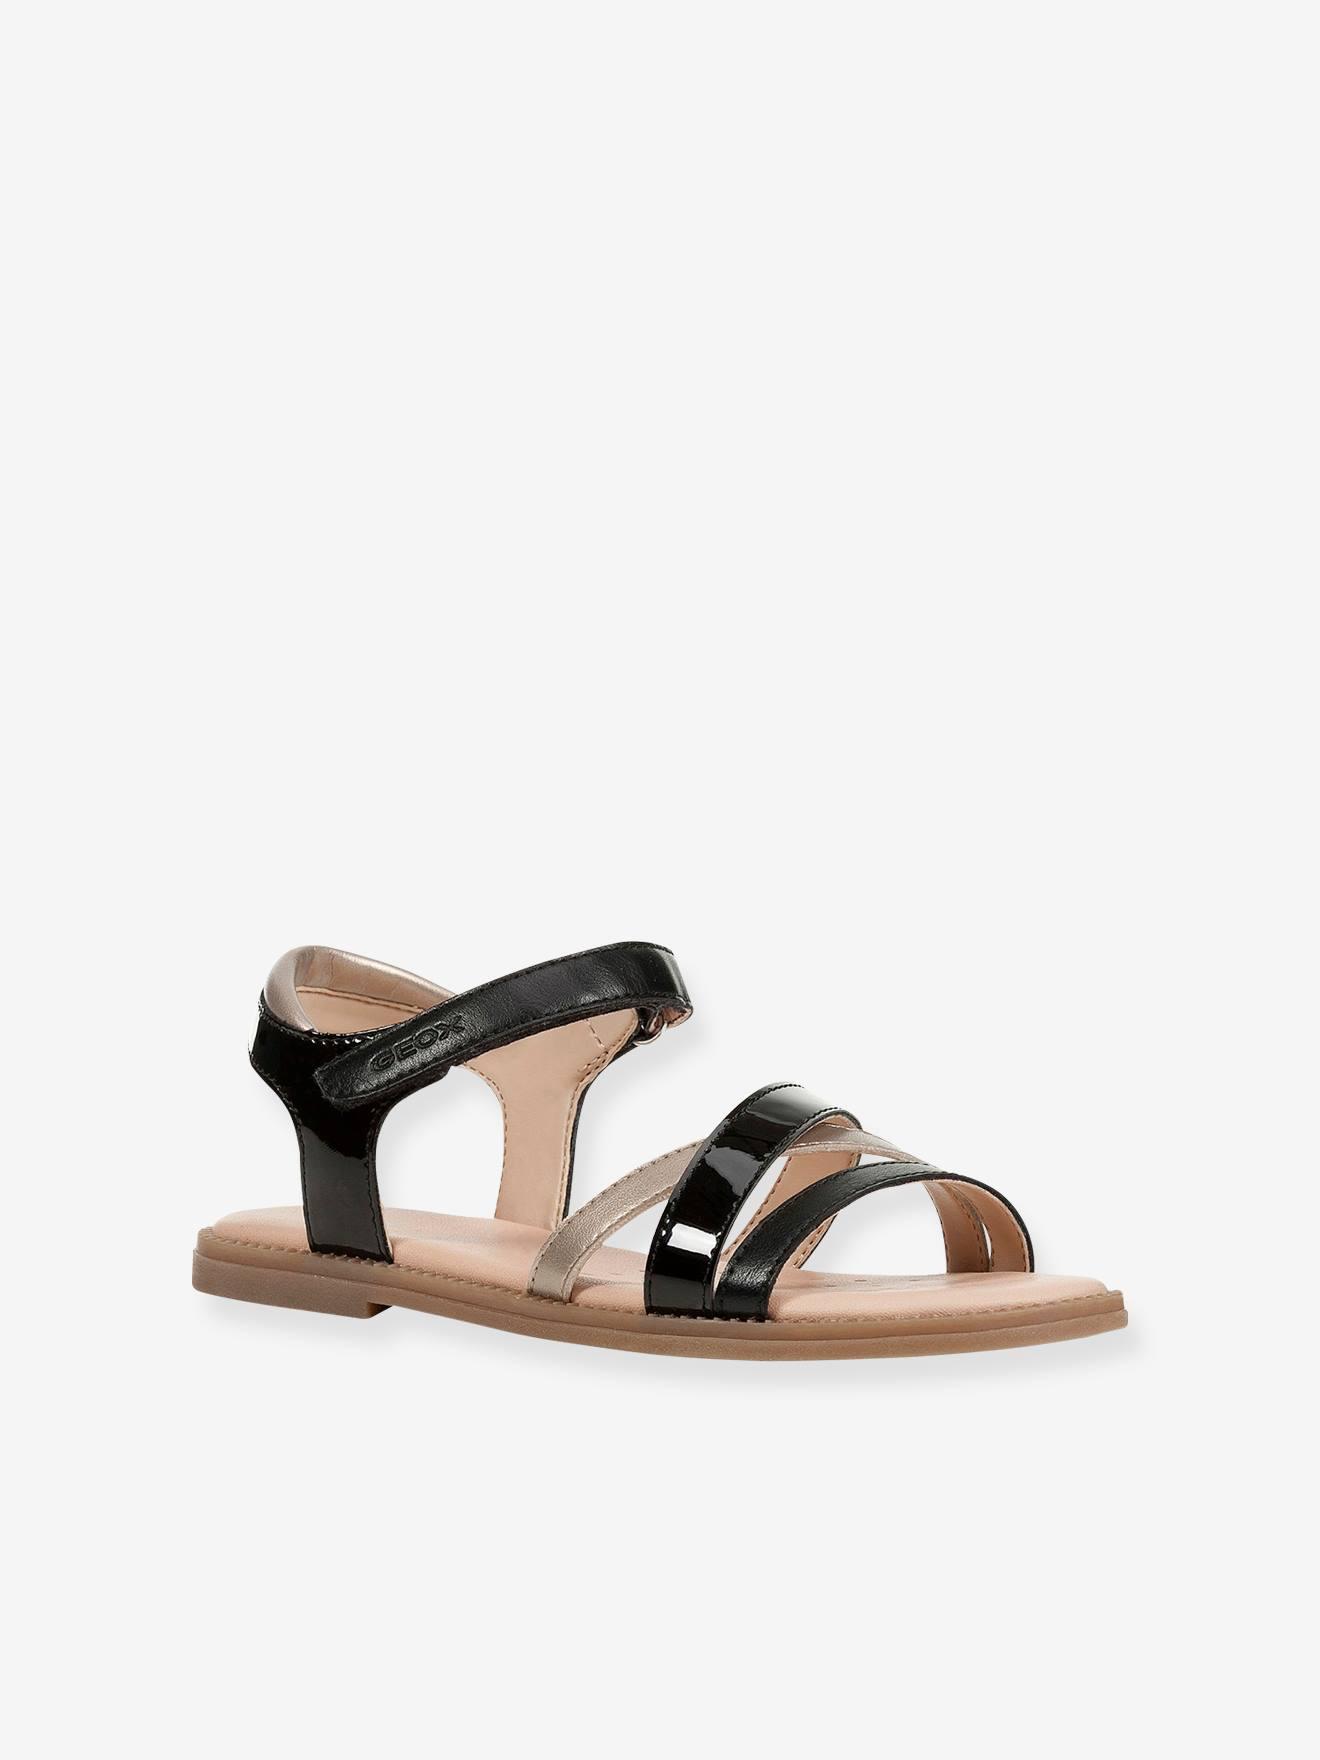 Sandales fille Karly GEOX® black platinium, Chaussures